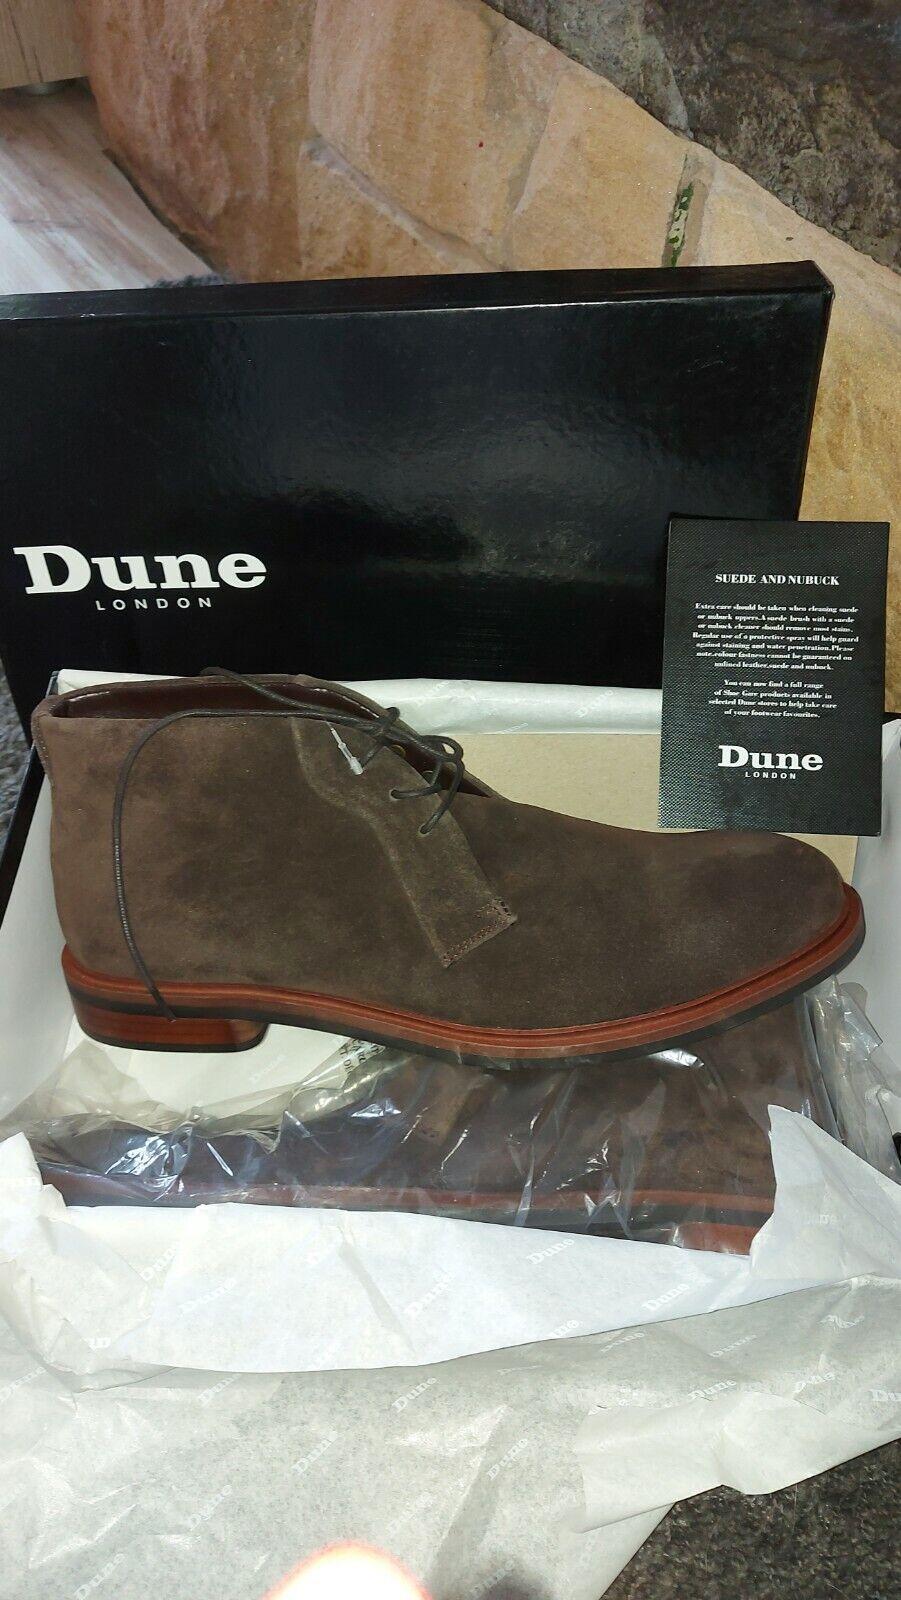 BN BOXED DUNE Dark Brown Suede Chukka Boots SIZE 11